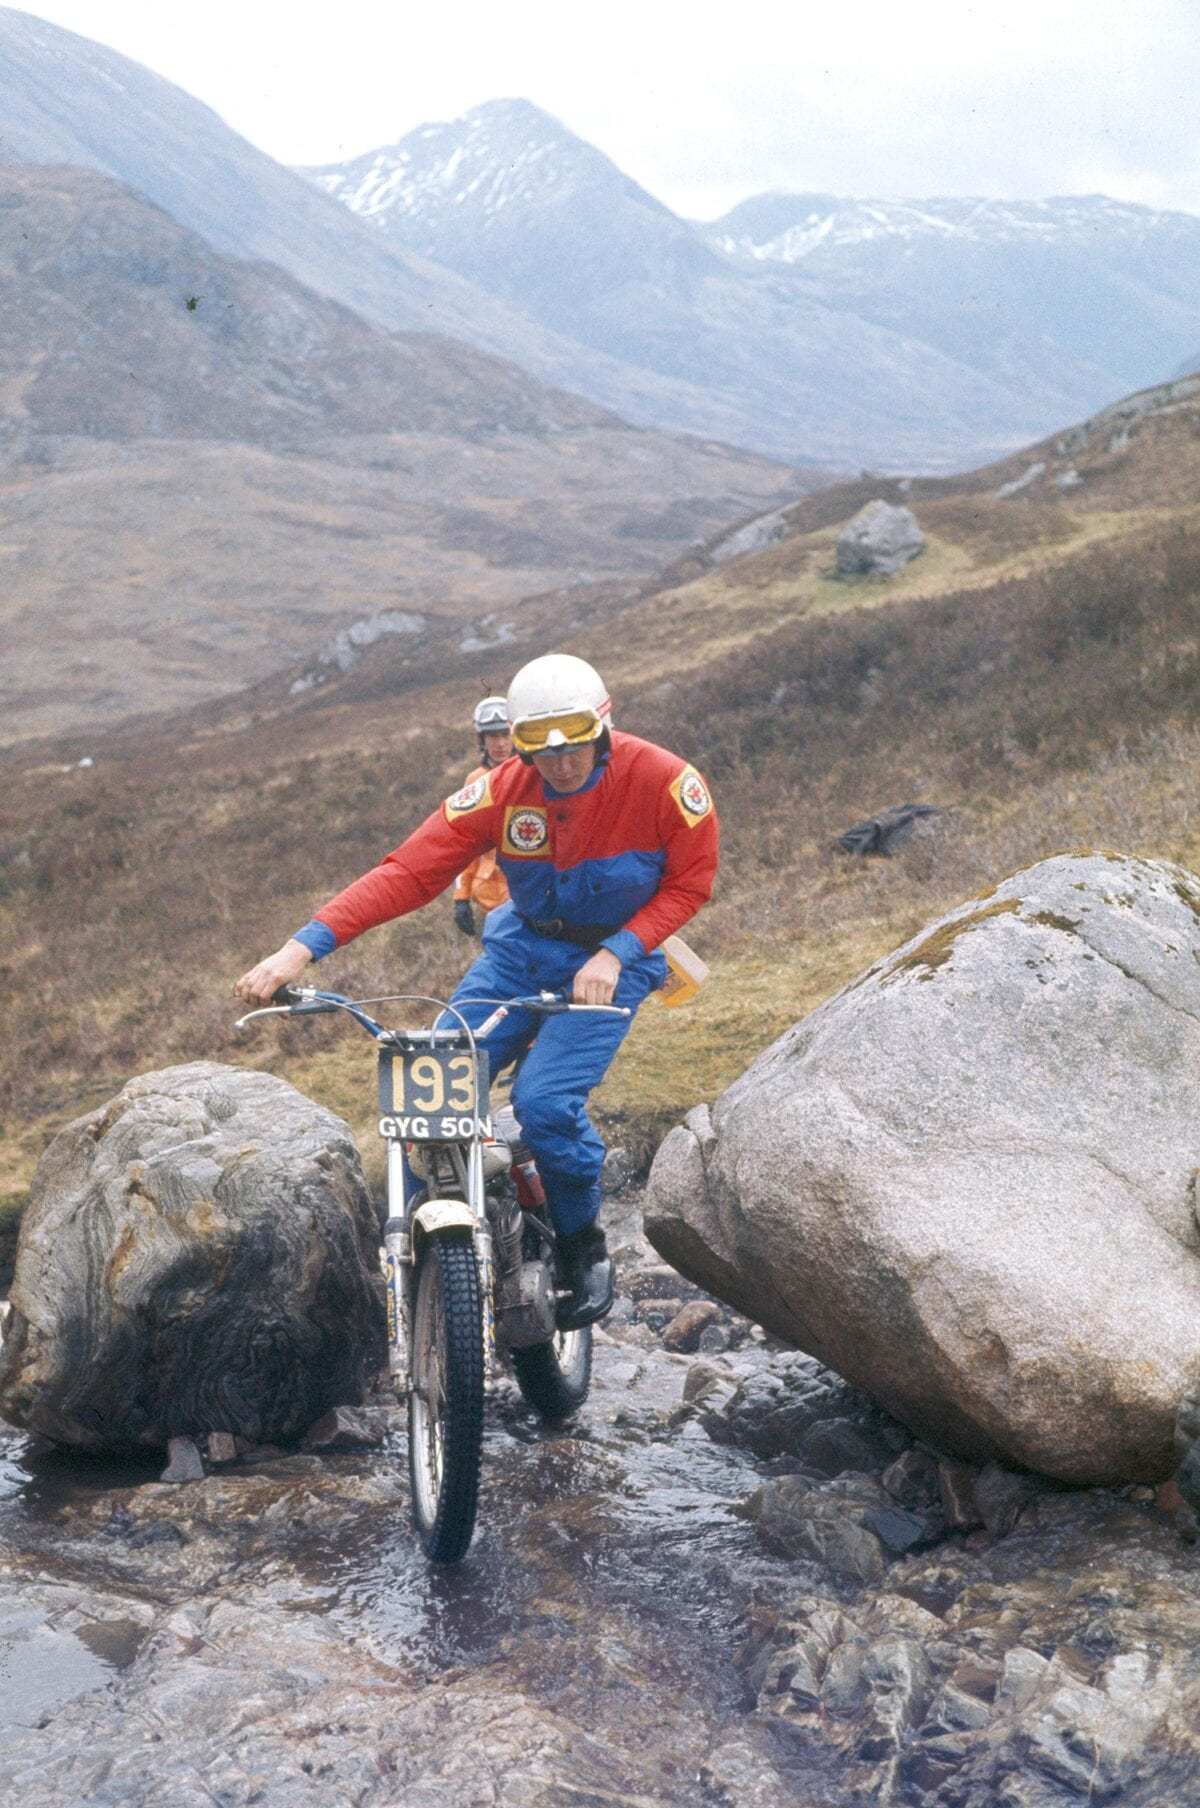 Nick-Jefferies-on-a-250cc-Yamaha-at-Callart-Falls.-Credit---Mortons-Archive